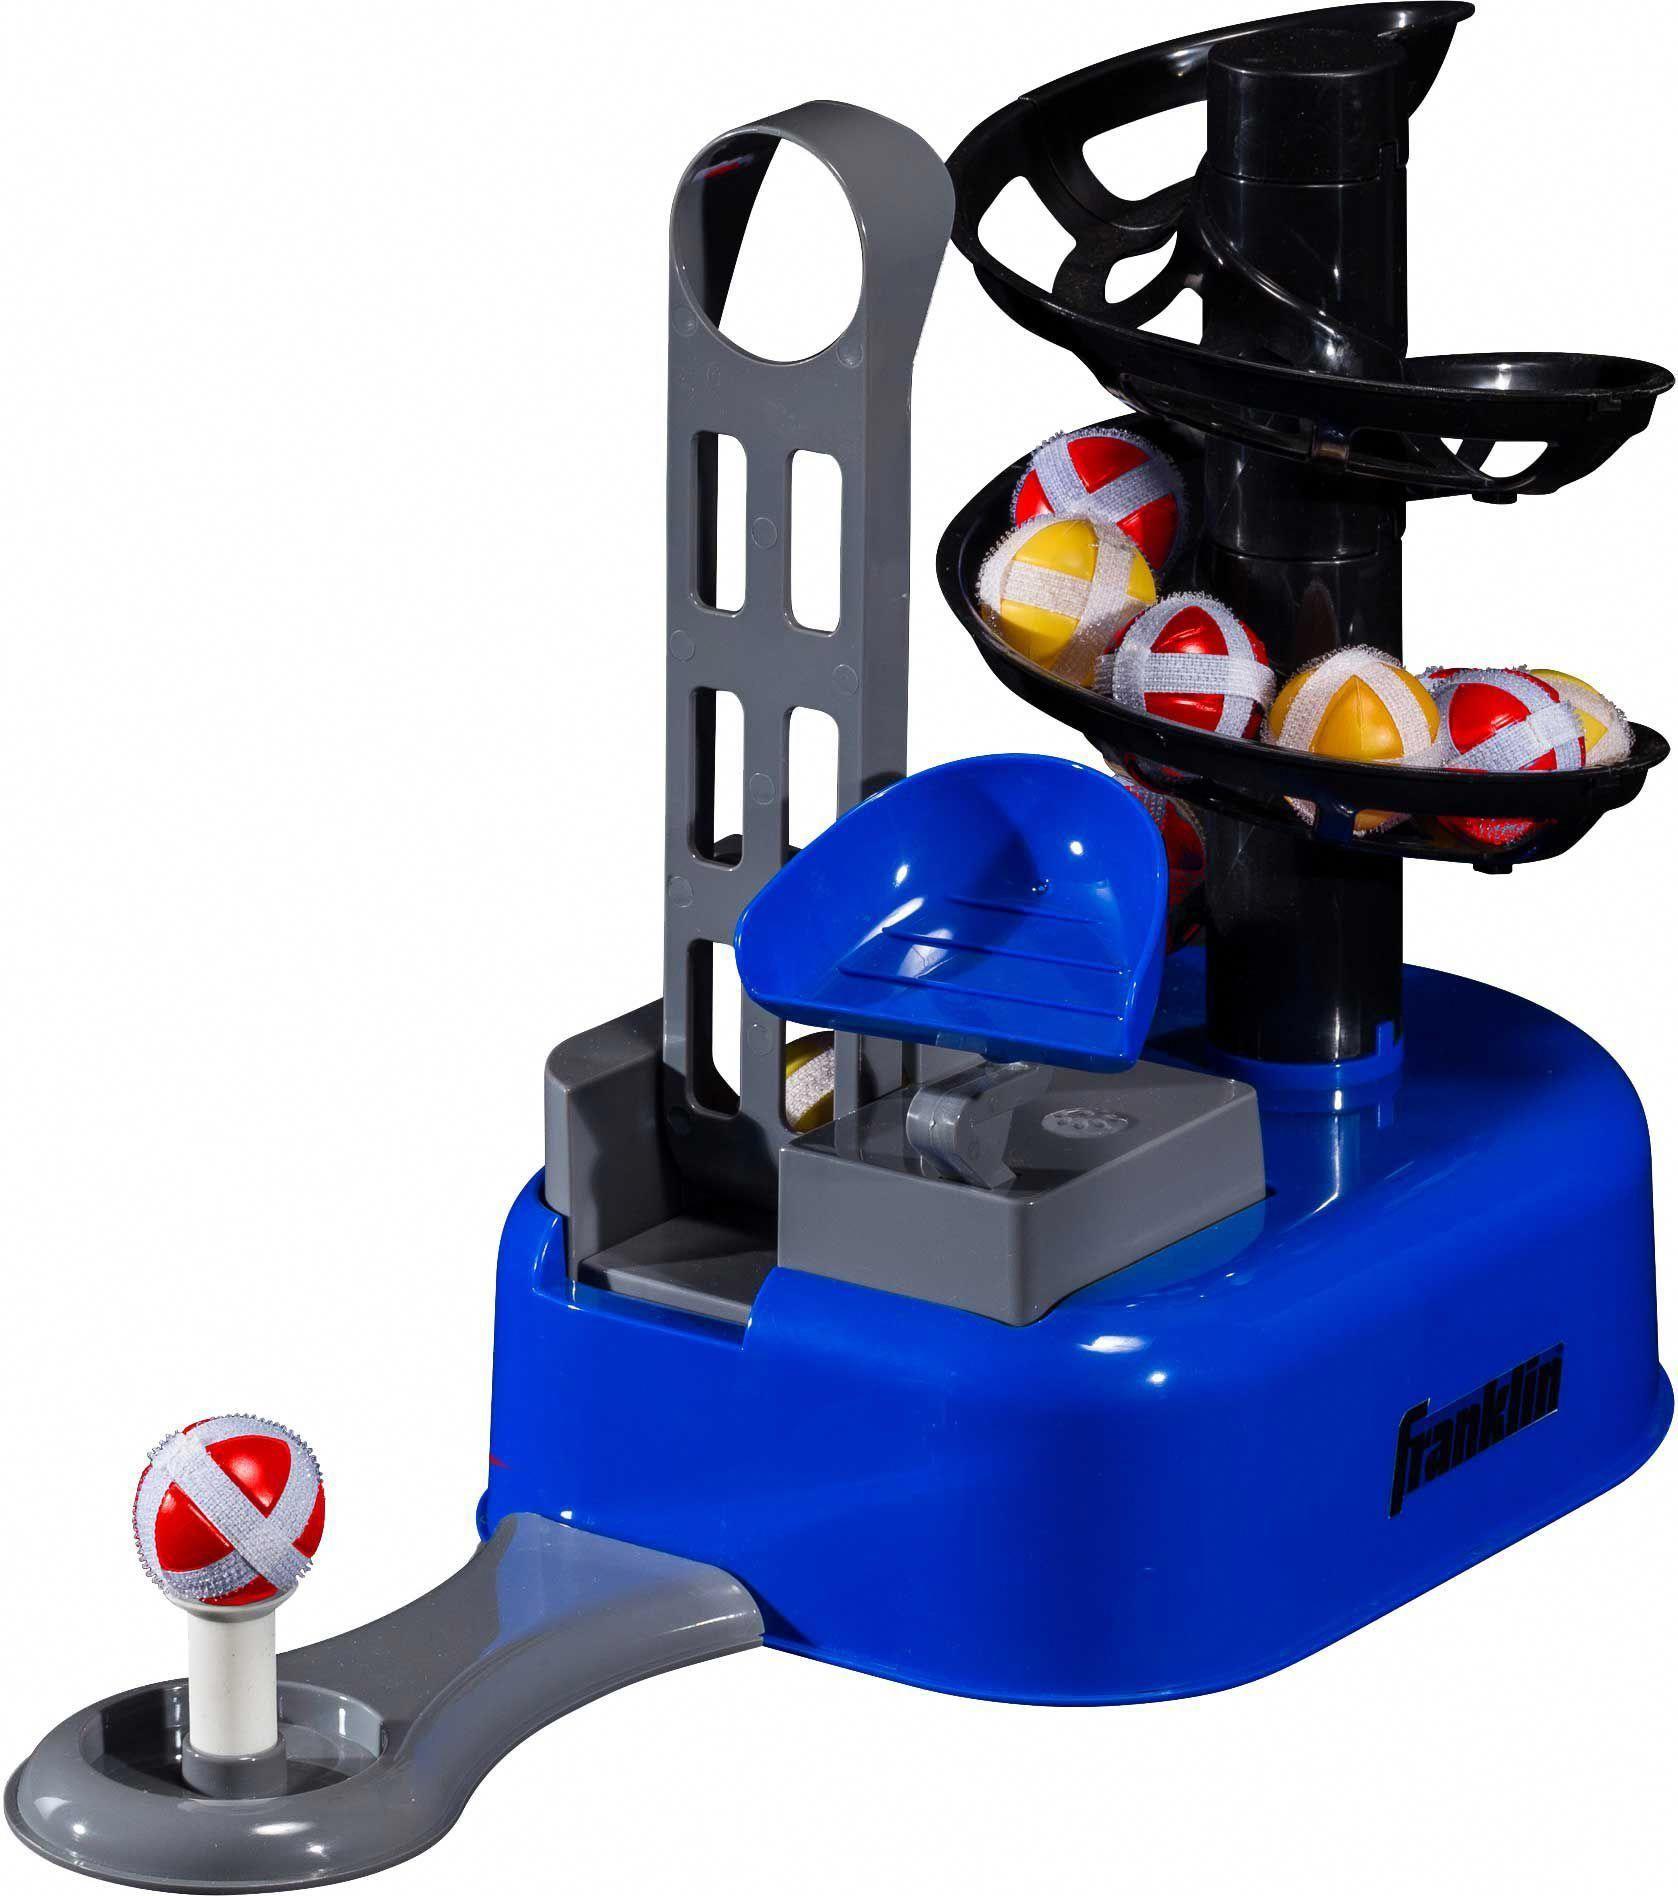 Franklin Sports Tee Up Golf ladiesgolf Golf tips